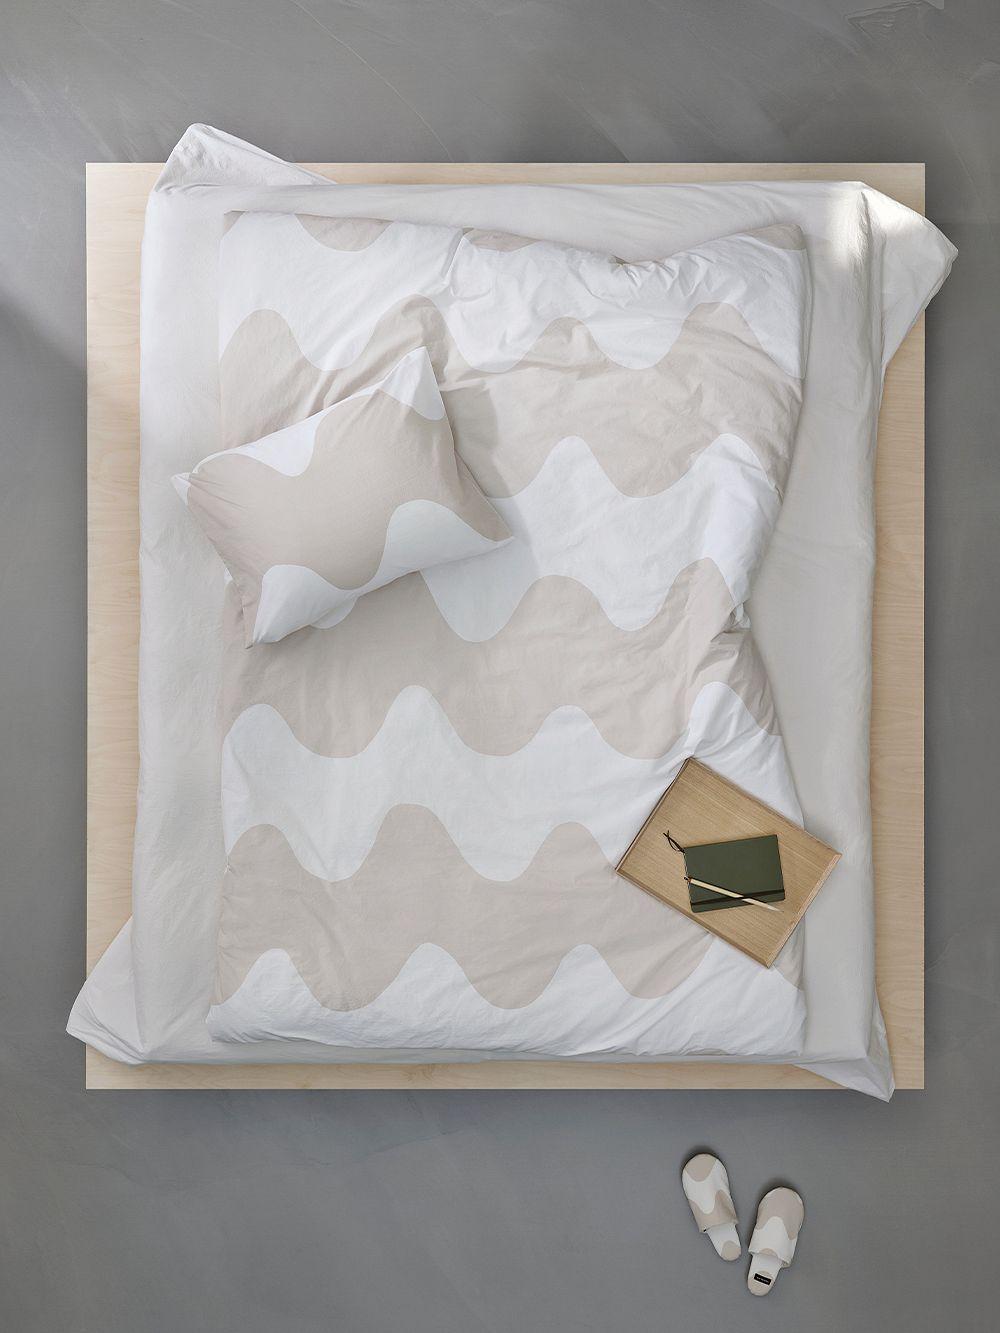 Marimekko Lokki double duvet cover in beige